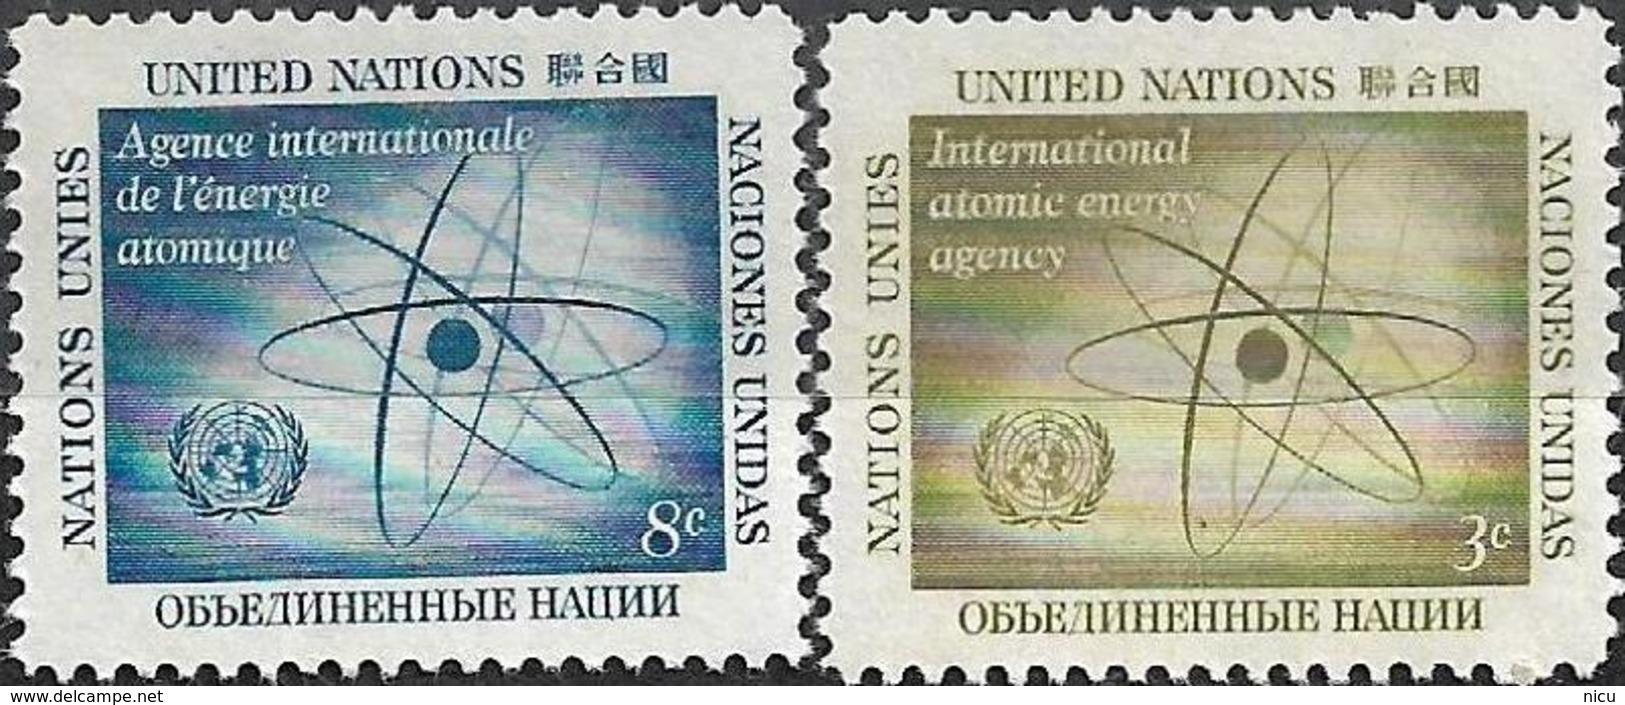 1958 - INTERNATIONAL ATOMIC ENERGY AGENCY - Michel Nr. 66-67 = 0.50 € - New York -  VN Hauptquartier